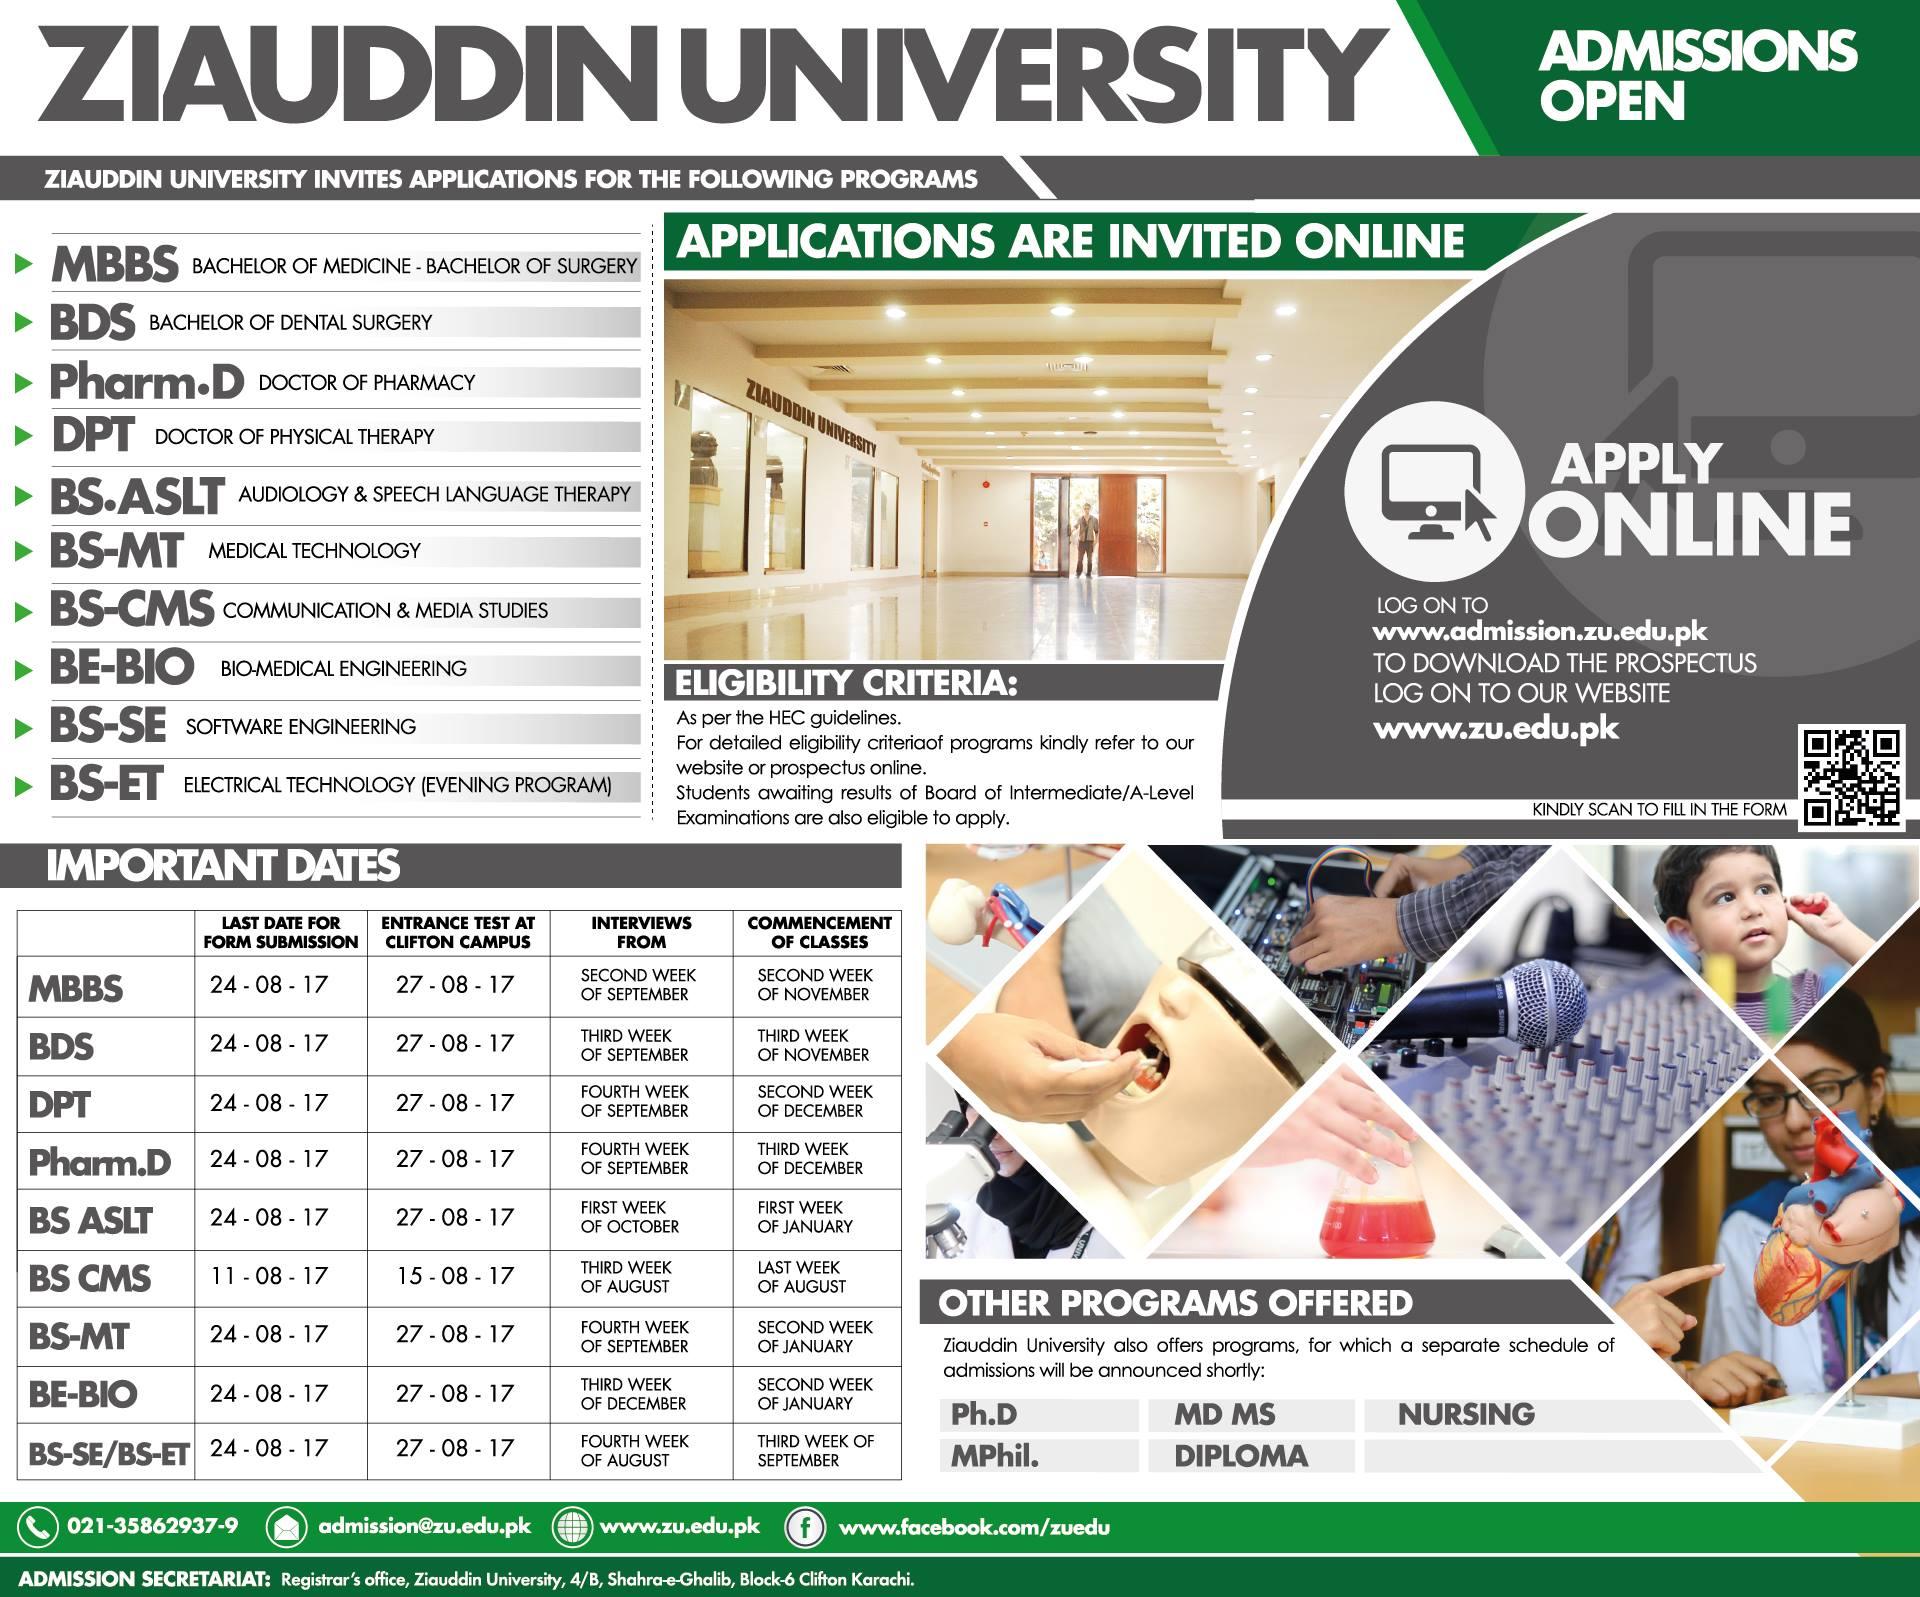 Ziauddin University admission programs